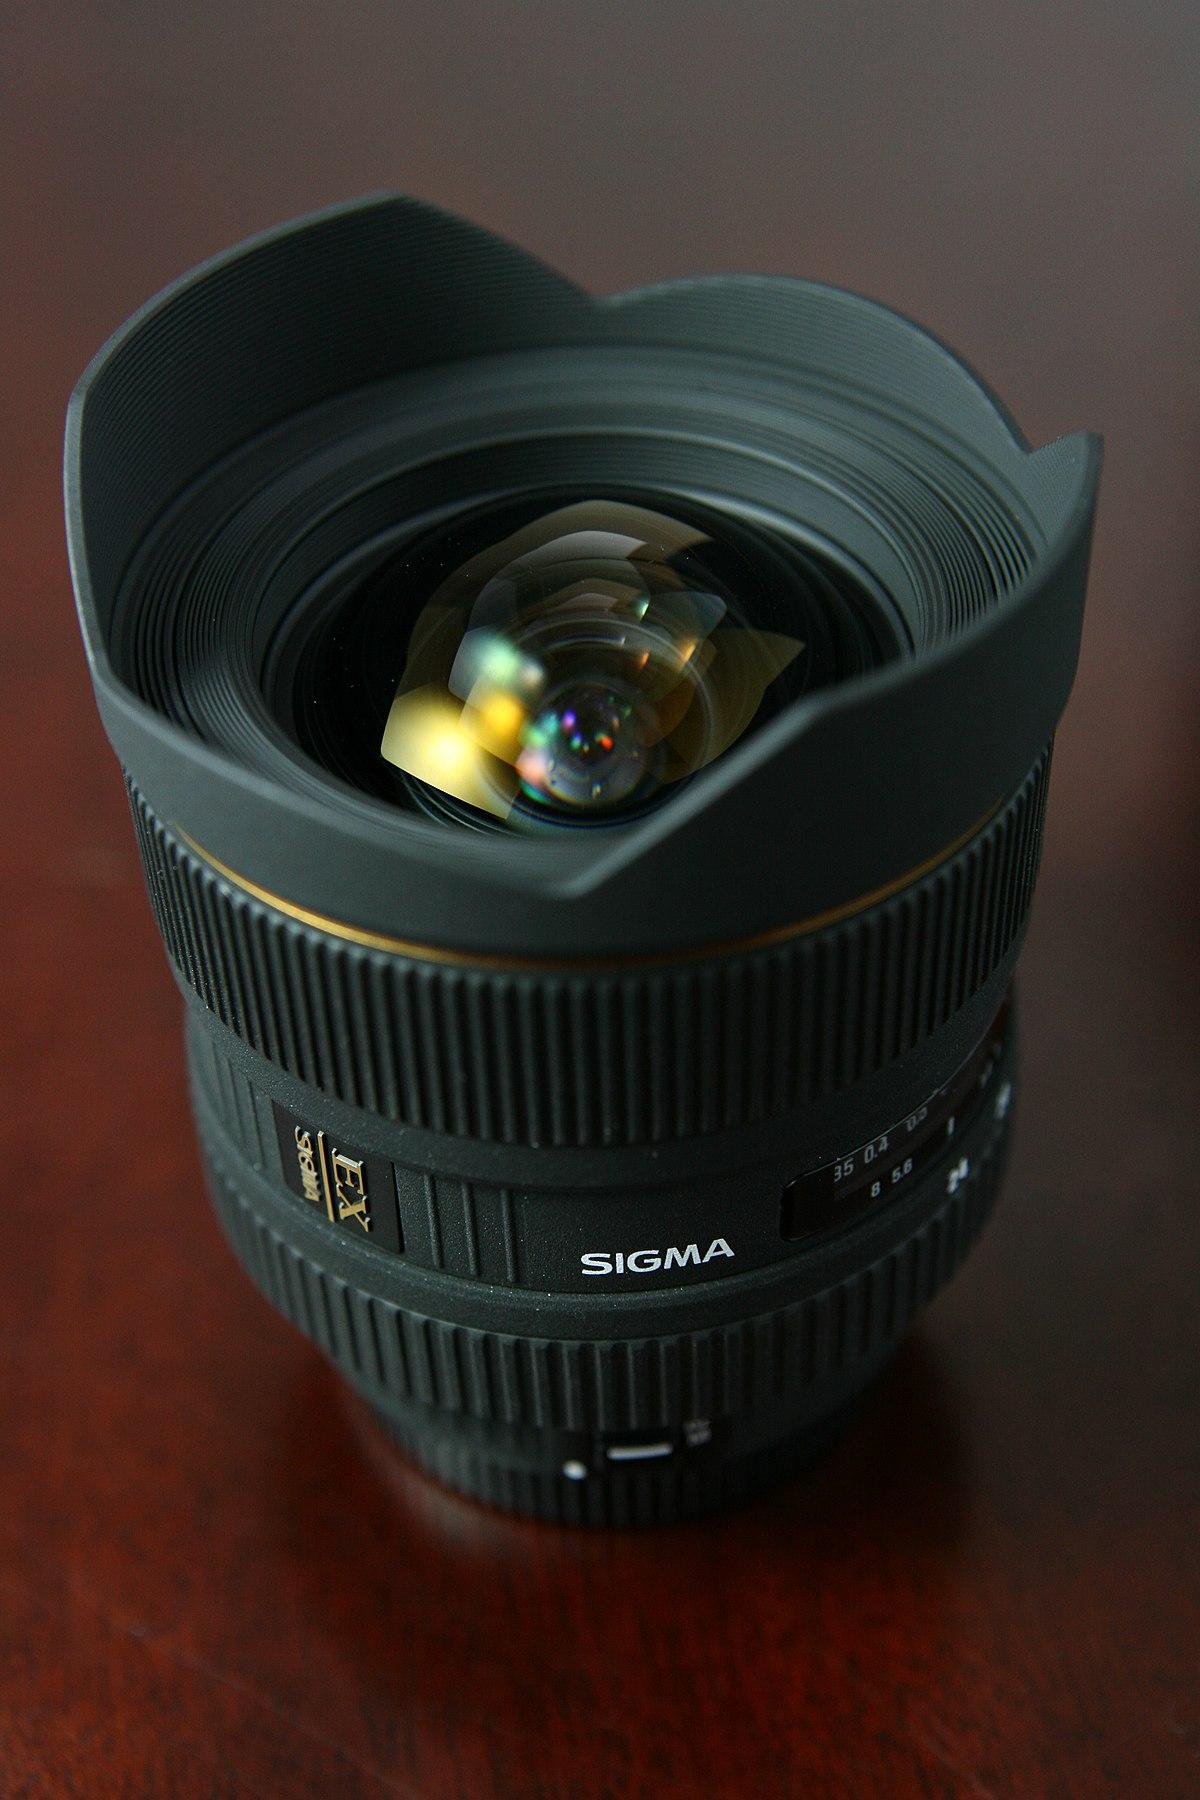 Sigma 12 24mm F 4 5 5 6 Lens Wikipedia